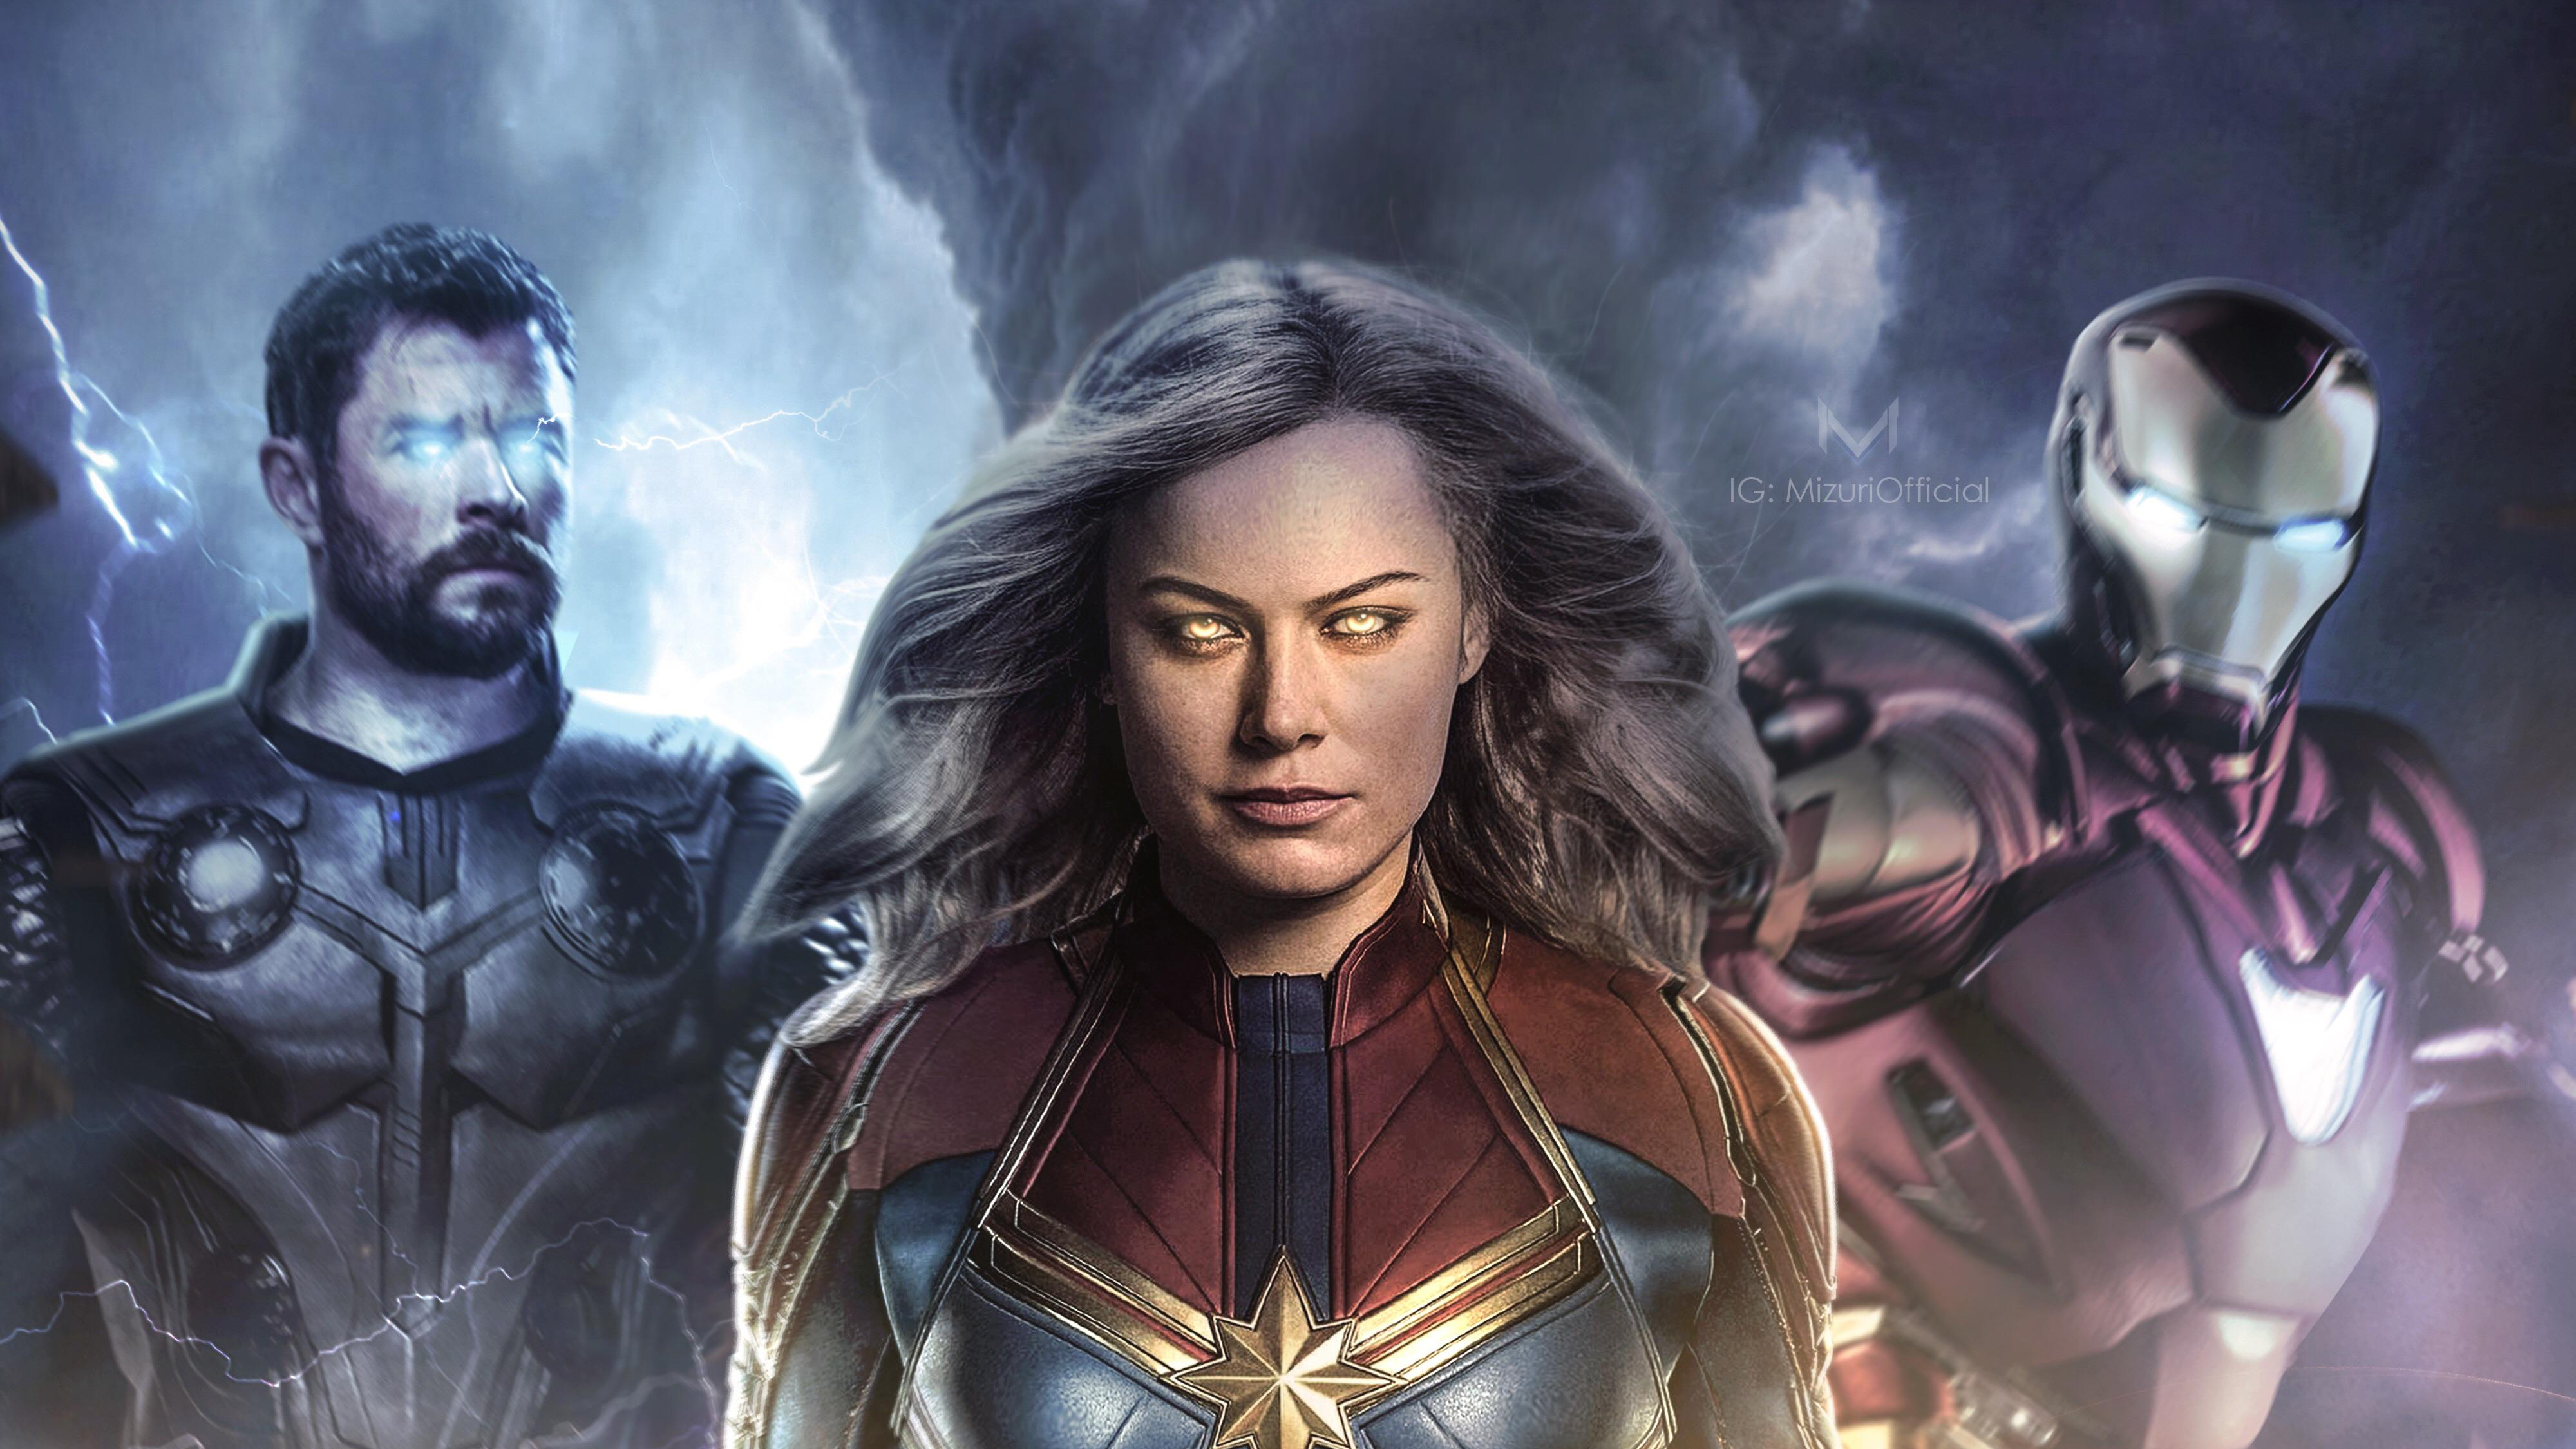 Avengers 4 Endgame 4K/HD Wallpapers Download (Mobile & PC ...